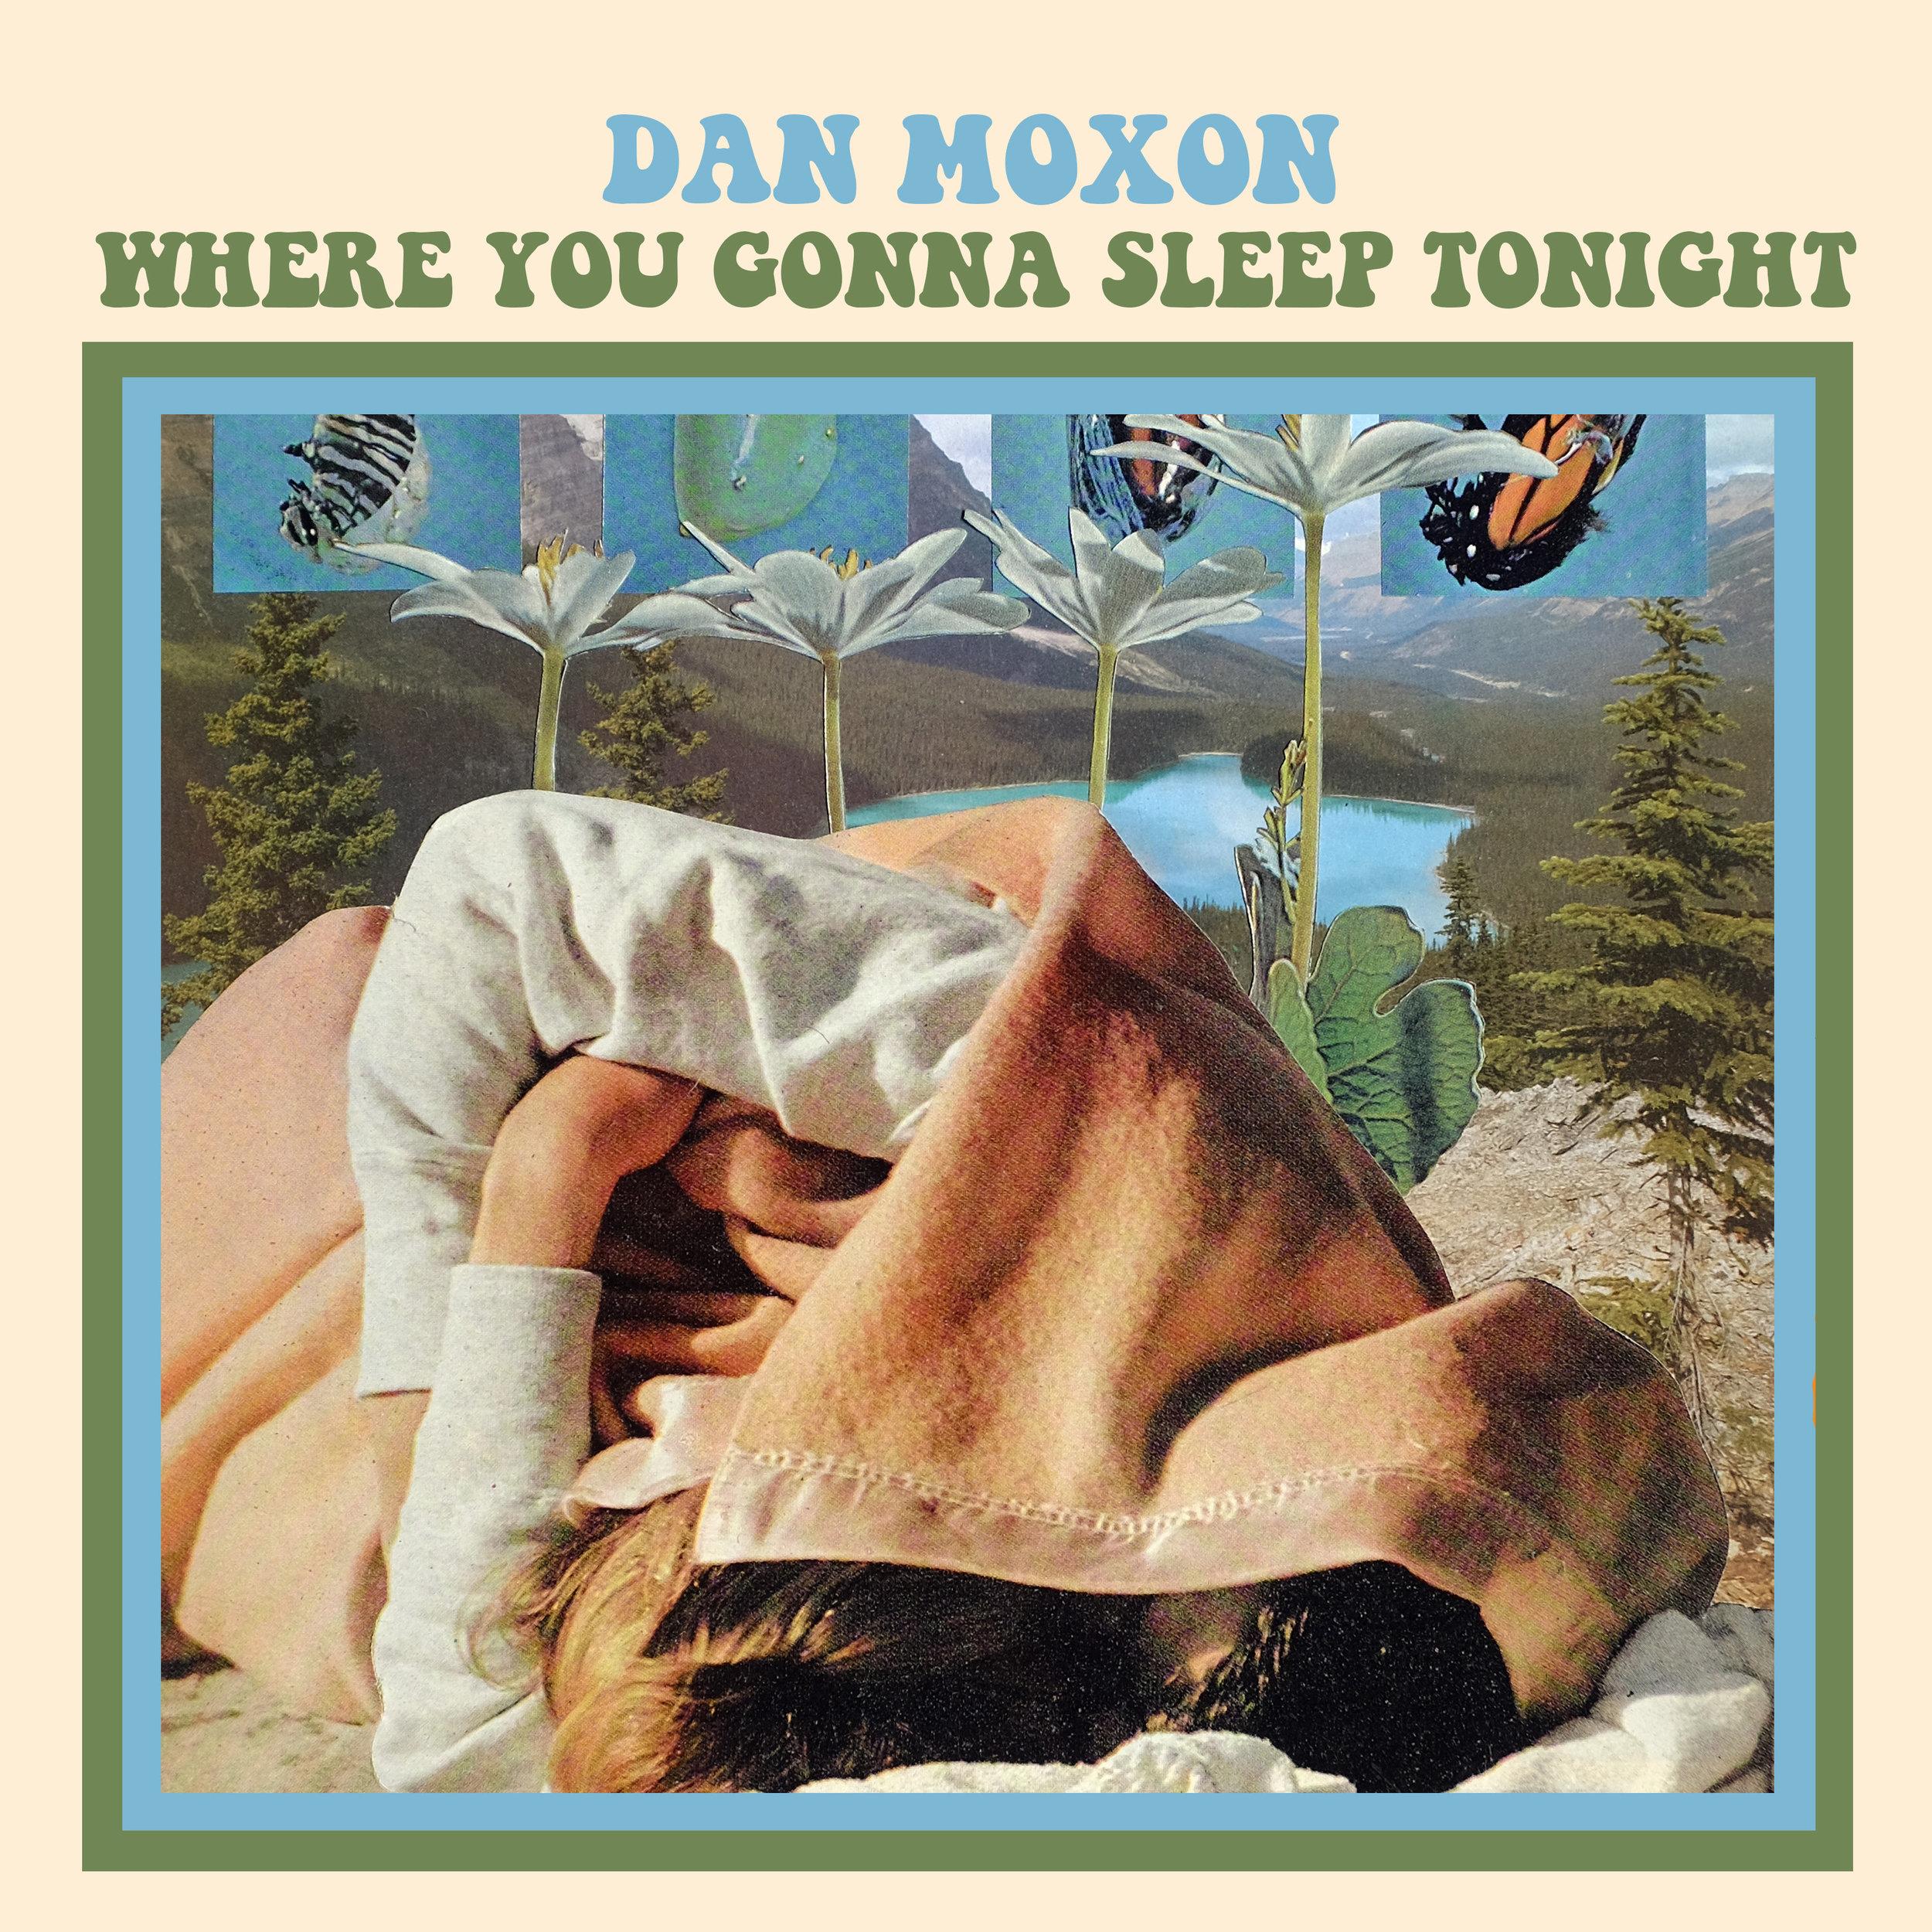 Dan Moxon - Single: Where You Gonna Sleep TonightRelease date: June 21, 2019